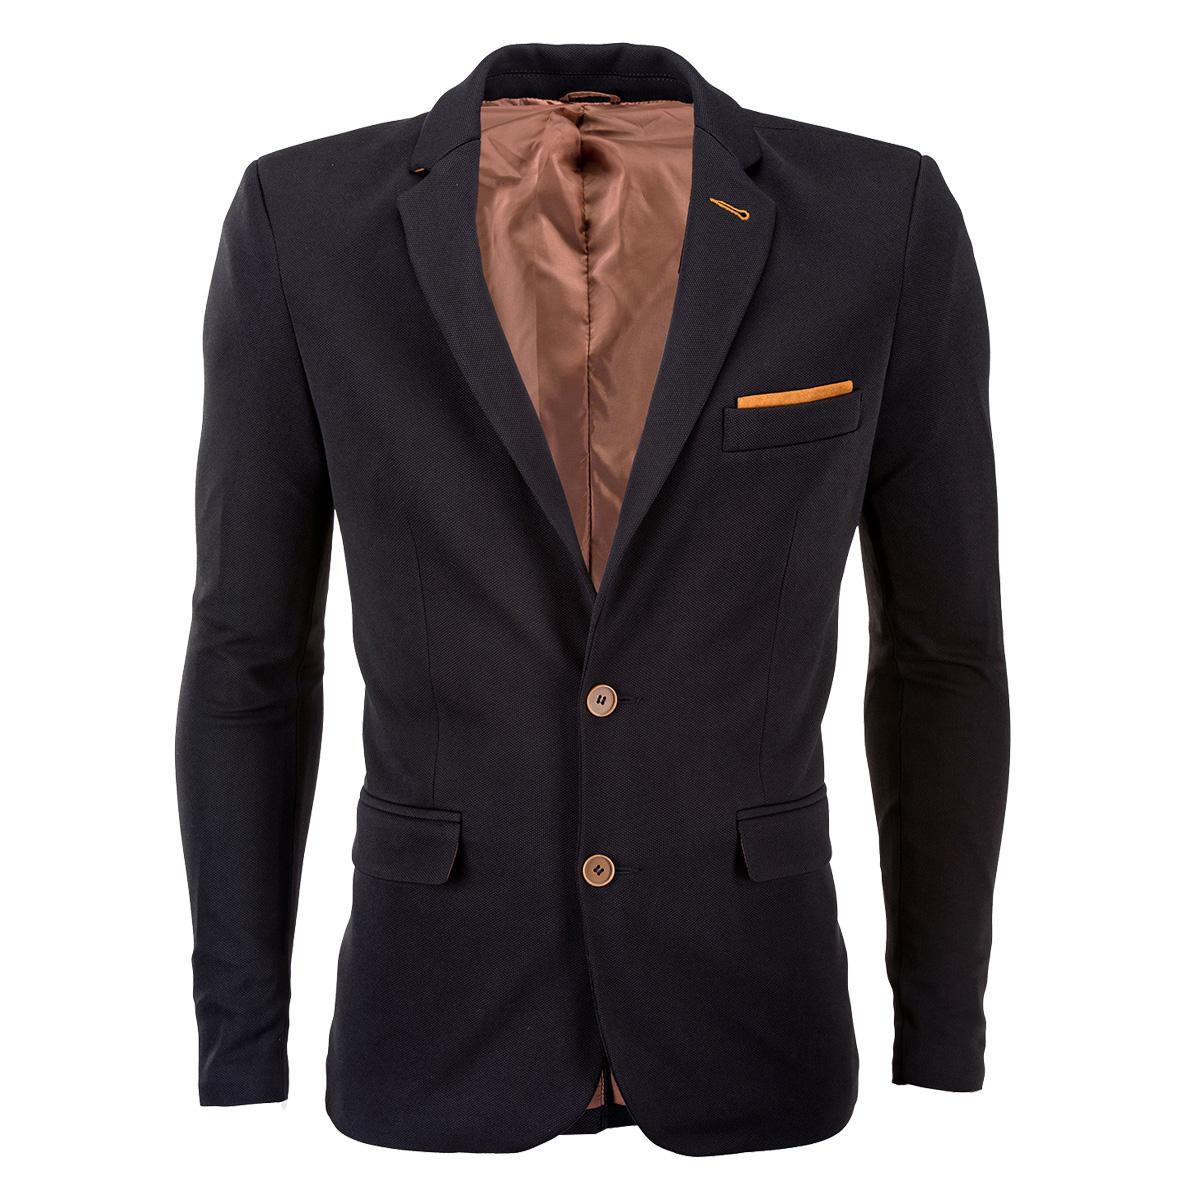 Ombre Clothing Pánske sako Filippo čierne - Glami.sk 09bb178eff2